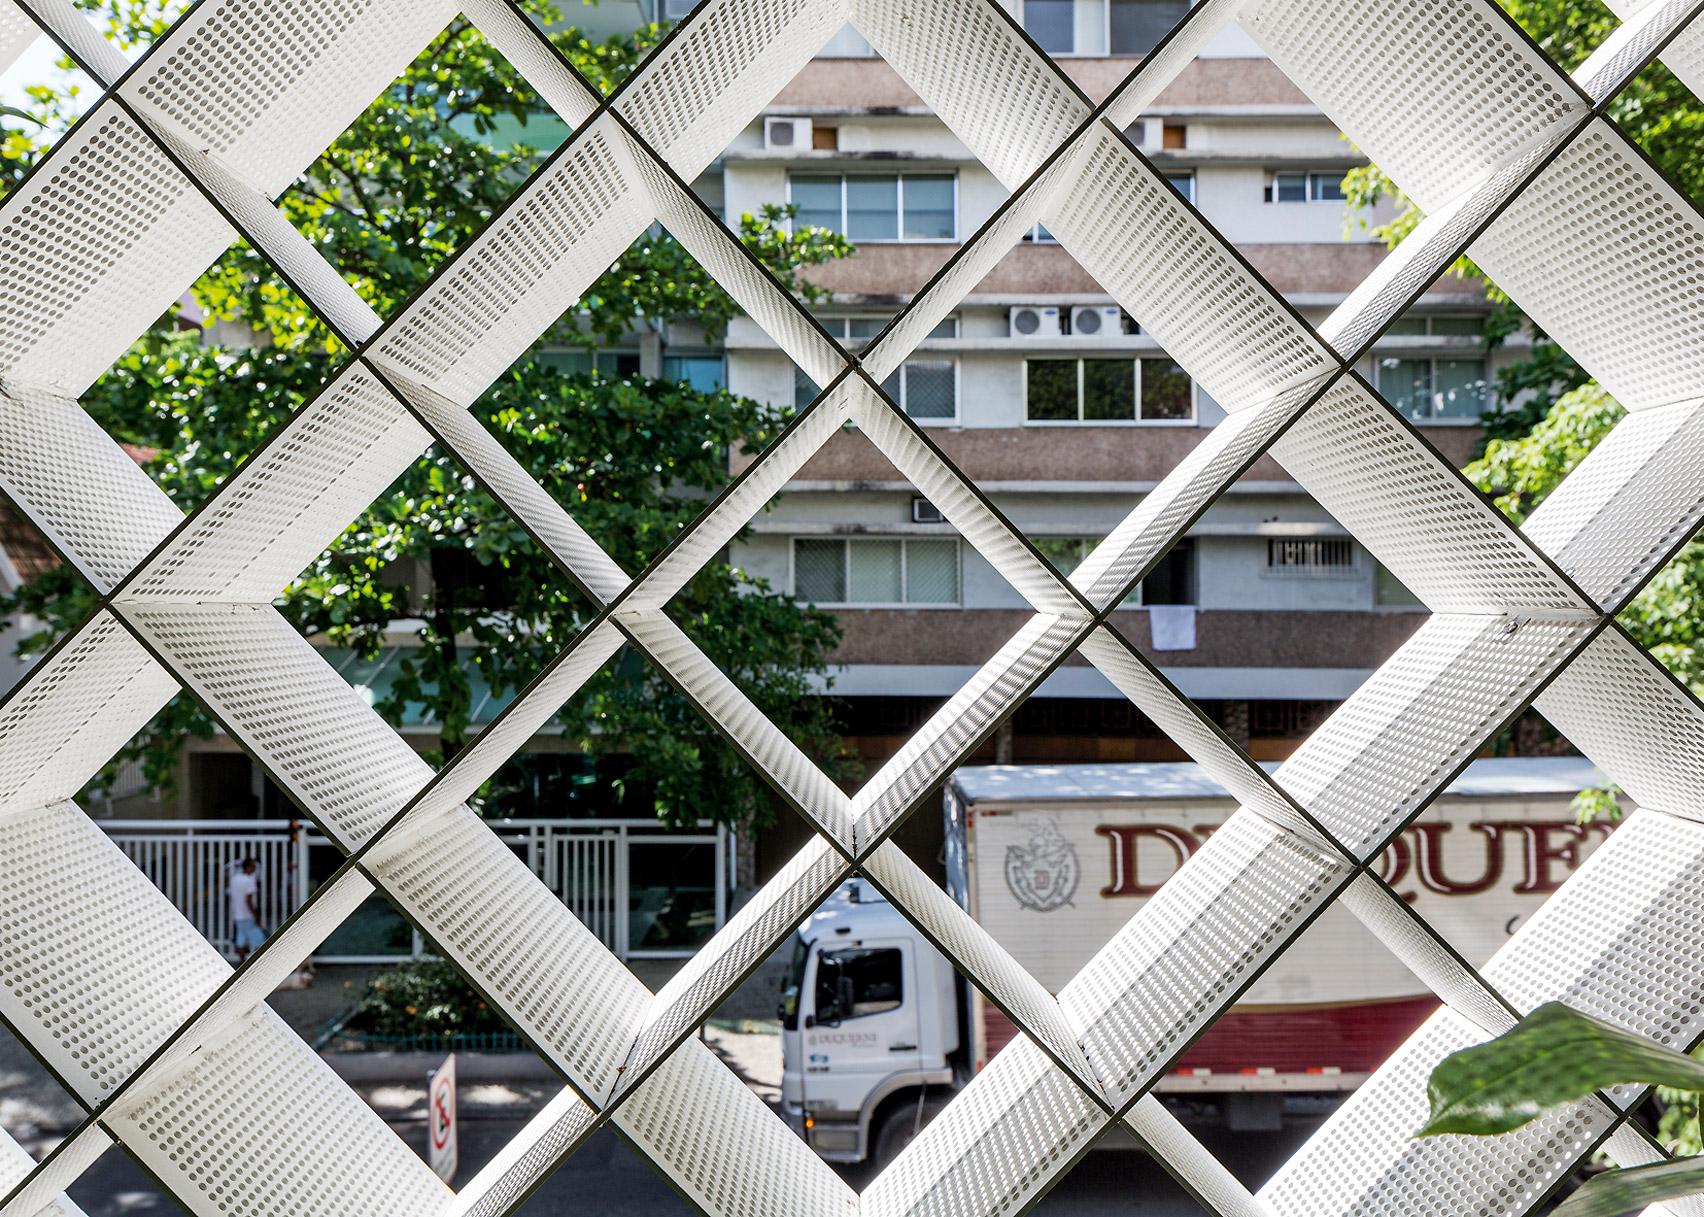 Anibal Office Building in Rio de Janeiro by Bernardes Arquitetura